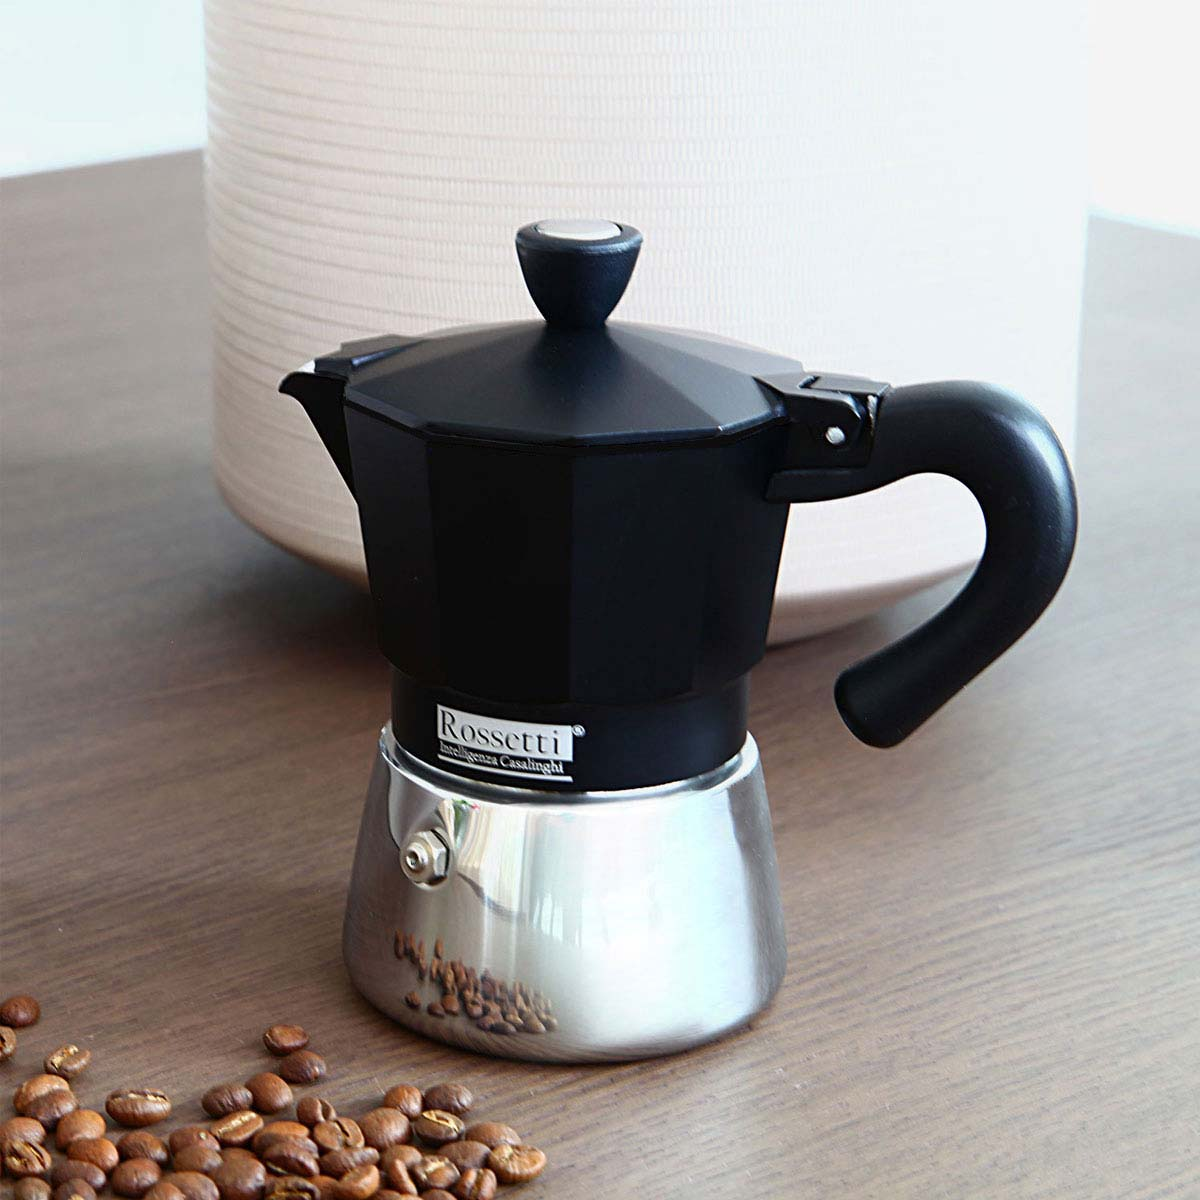 Rossetti Moka Italian 3 Espresso Cup black Induction Moka Coffee Espresso Maker Pot